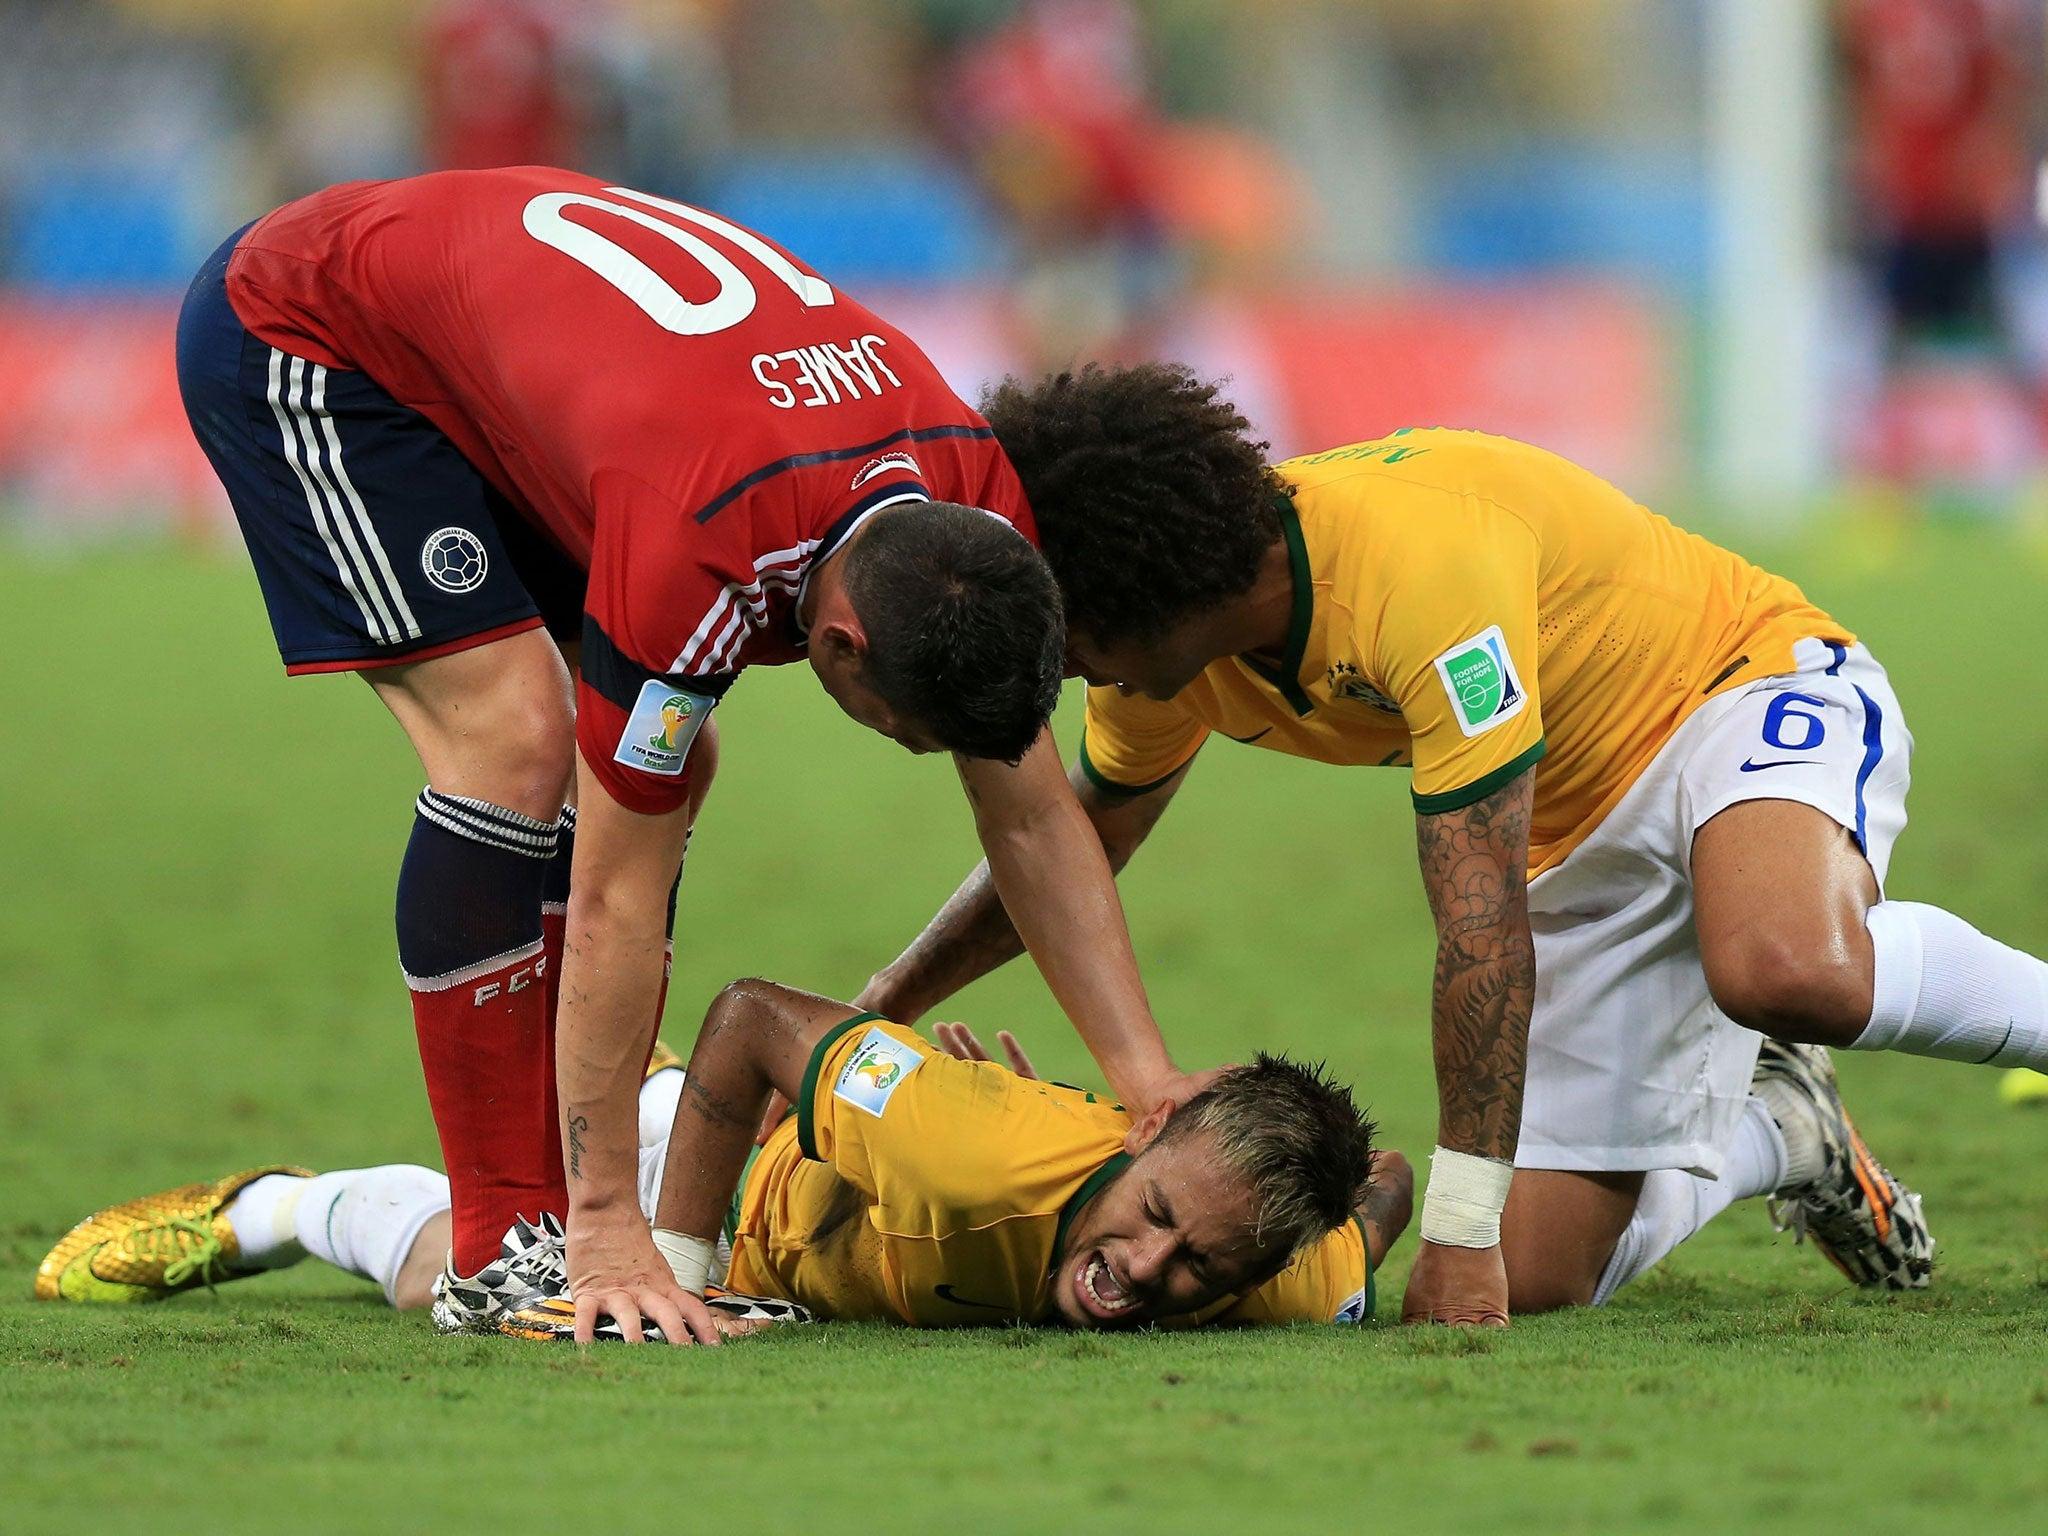 Neymar out of World Cup 2014 Juan Camilo Zuniga I did not